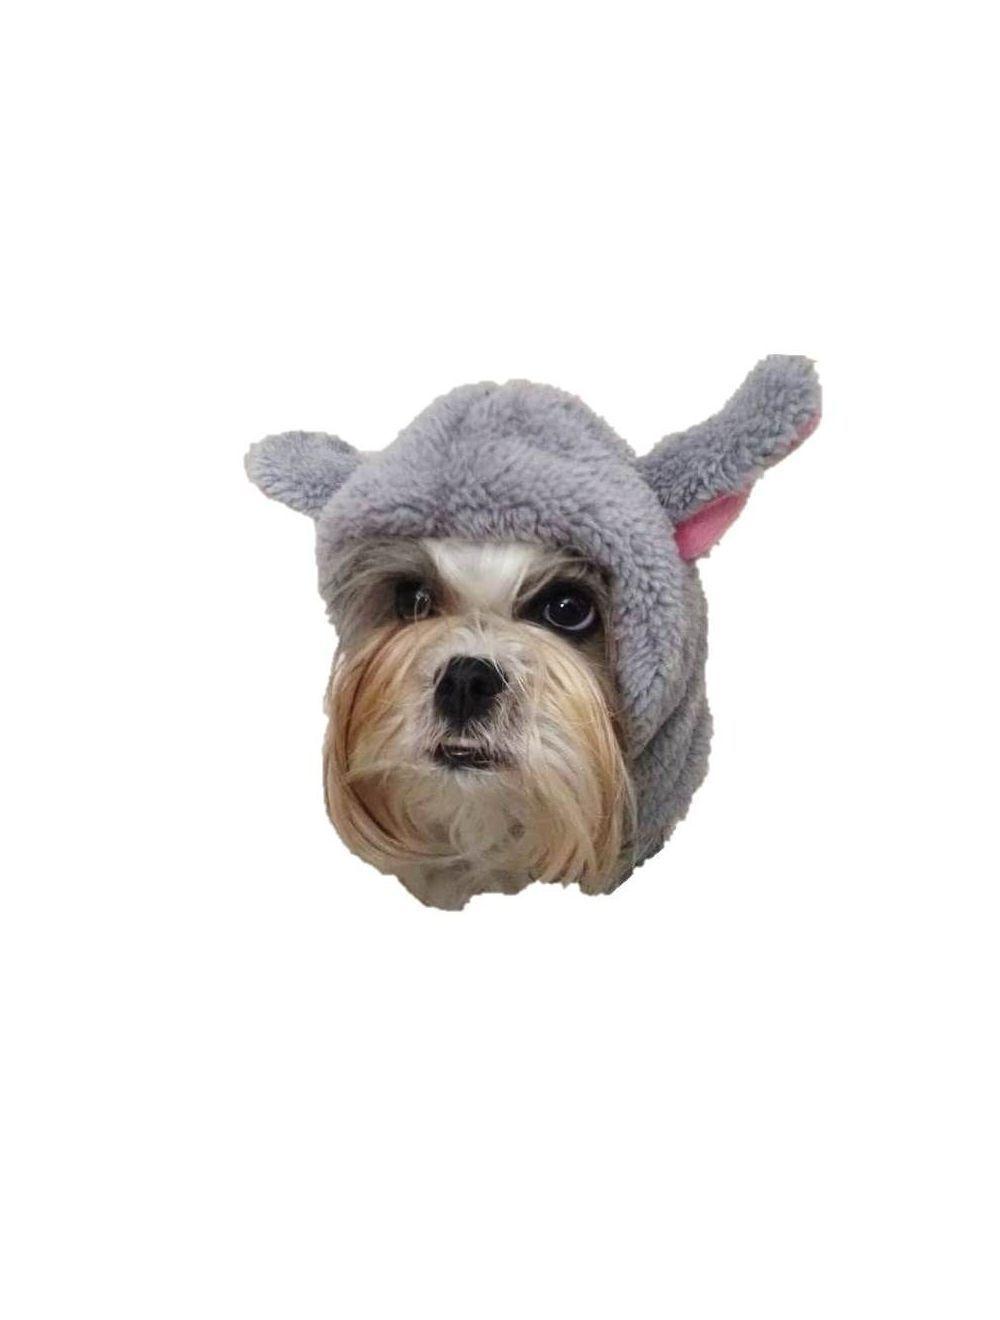 Orejas para perro ajustables de ratón-Ciudaddemascotas.com